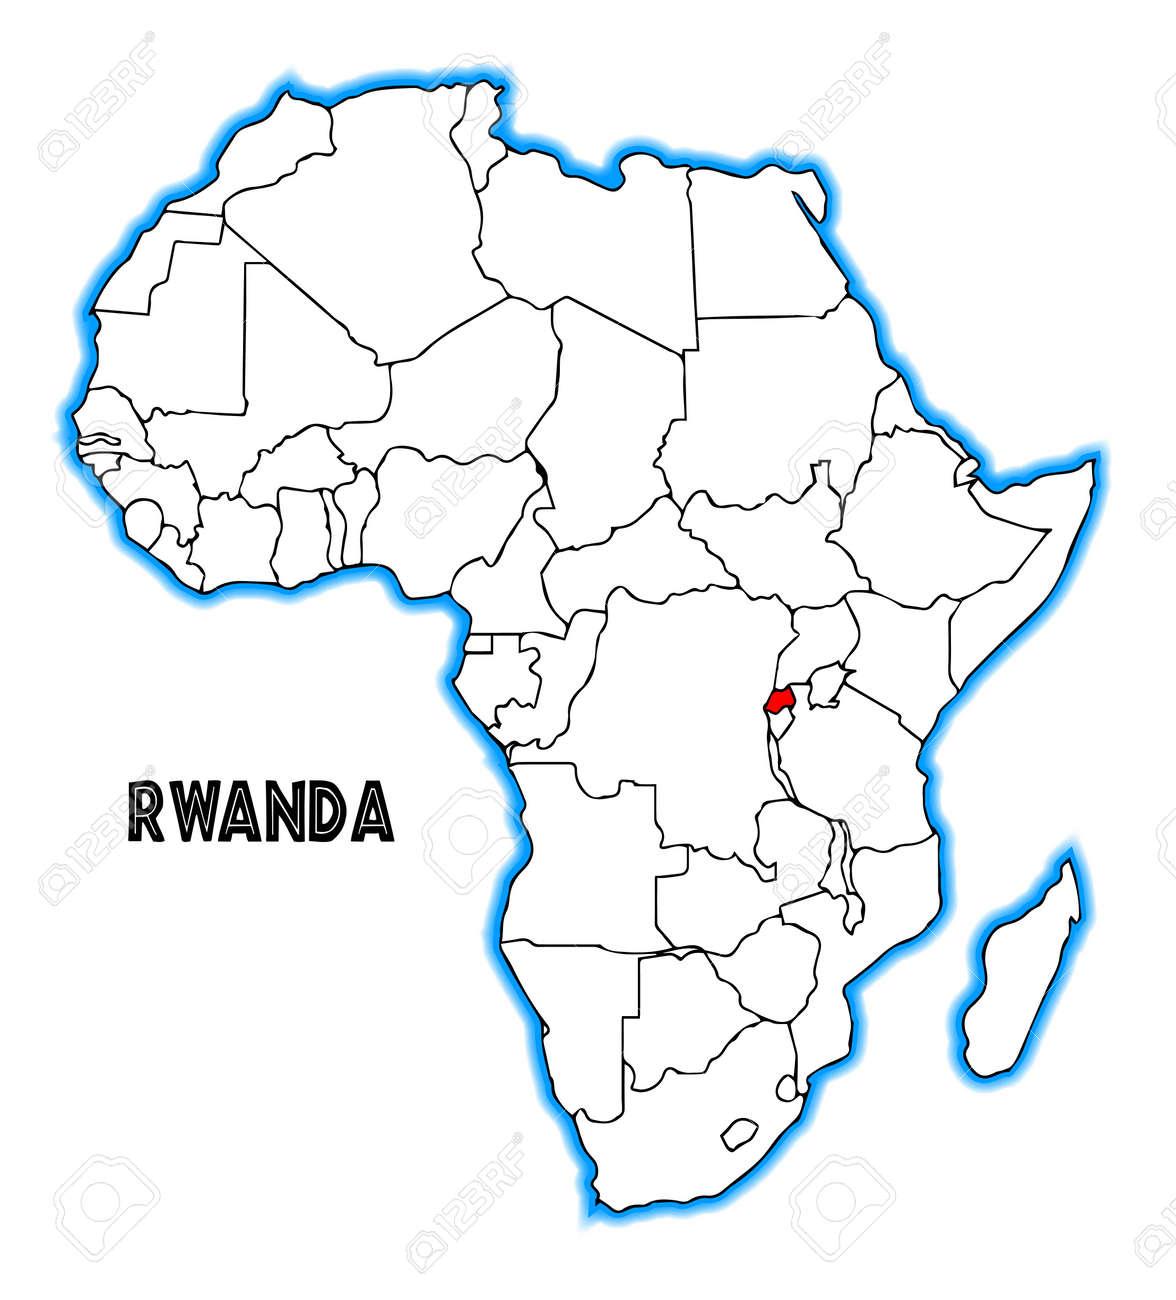 Carte Afrique Rwanda.Rwanda Apercu Incrustee Dans Une Carte De L Afrique Sur Un Fond Blanc